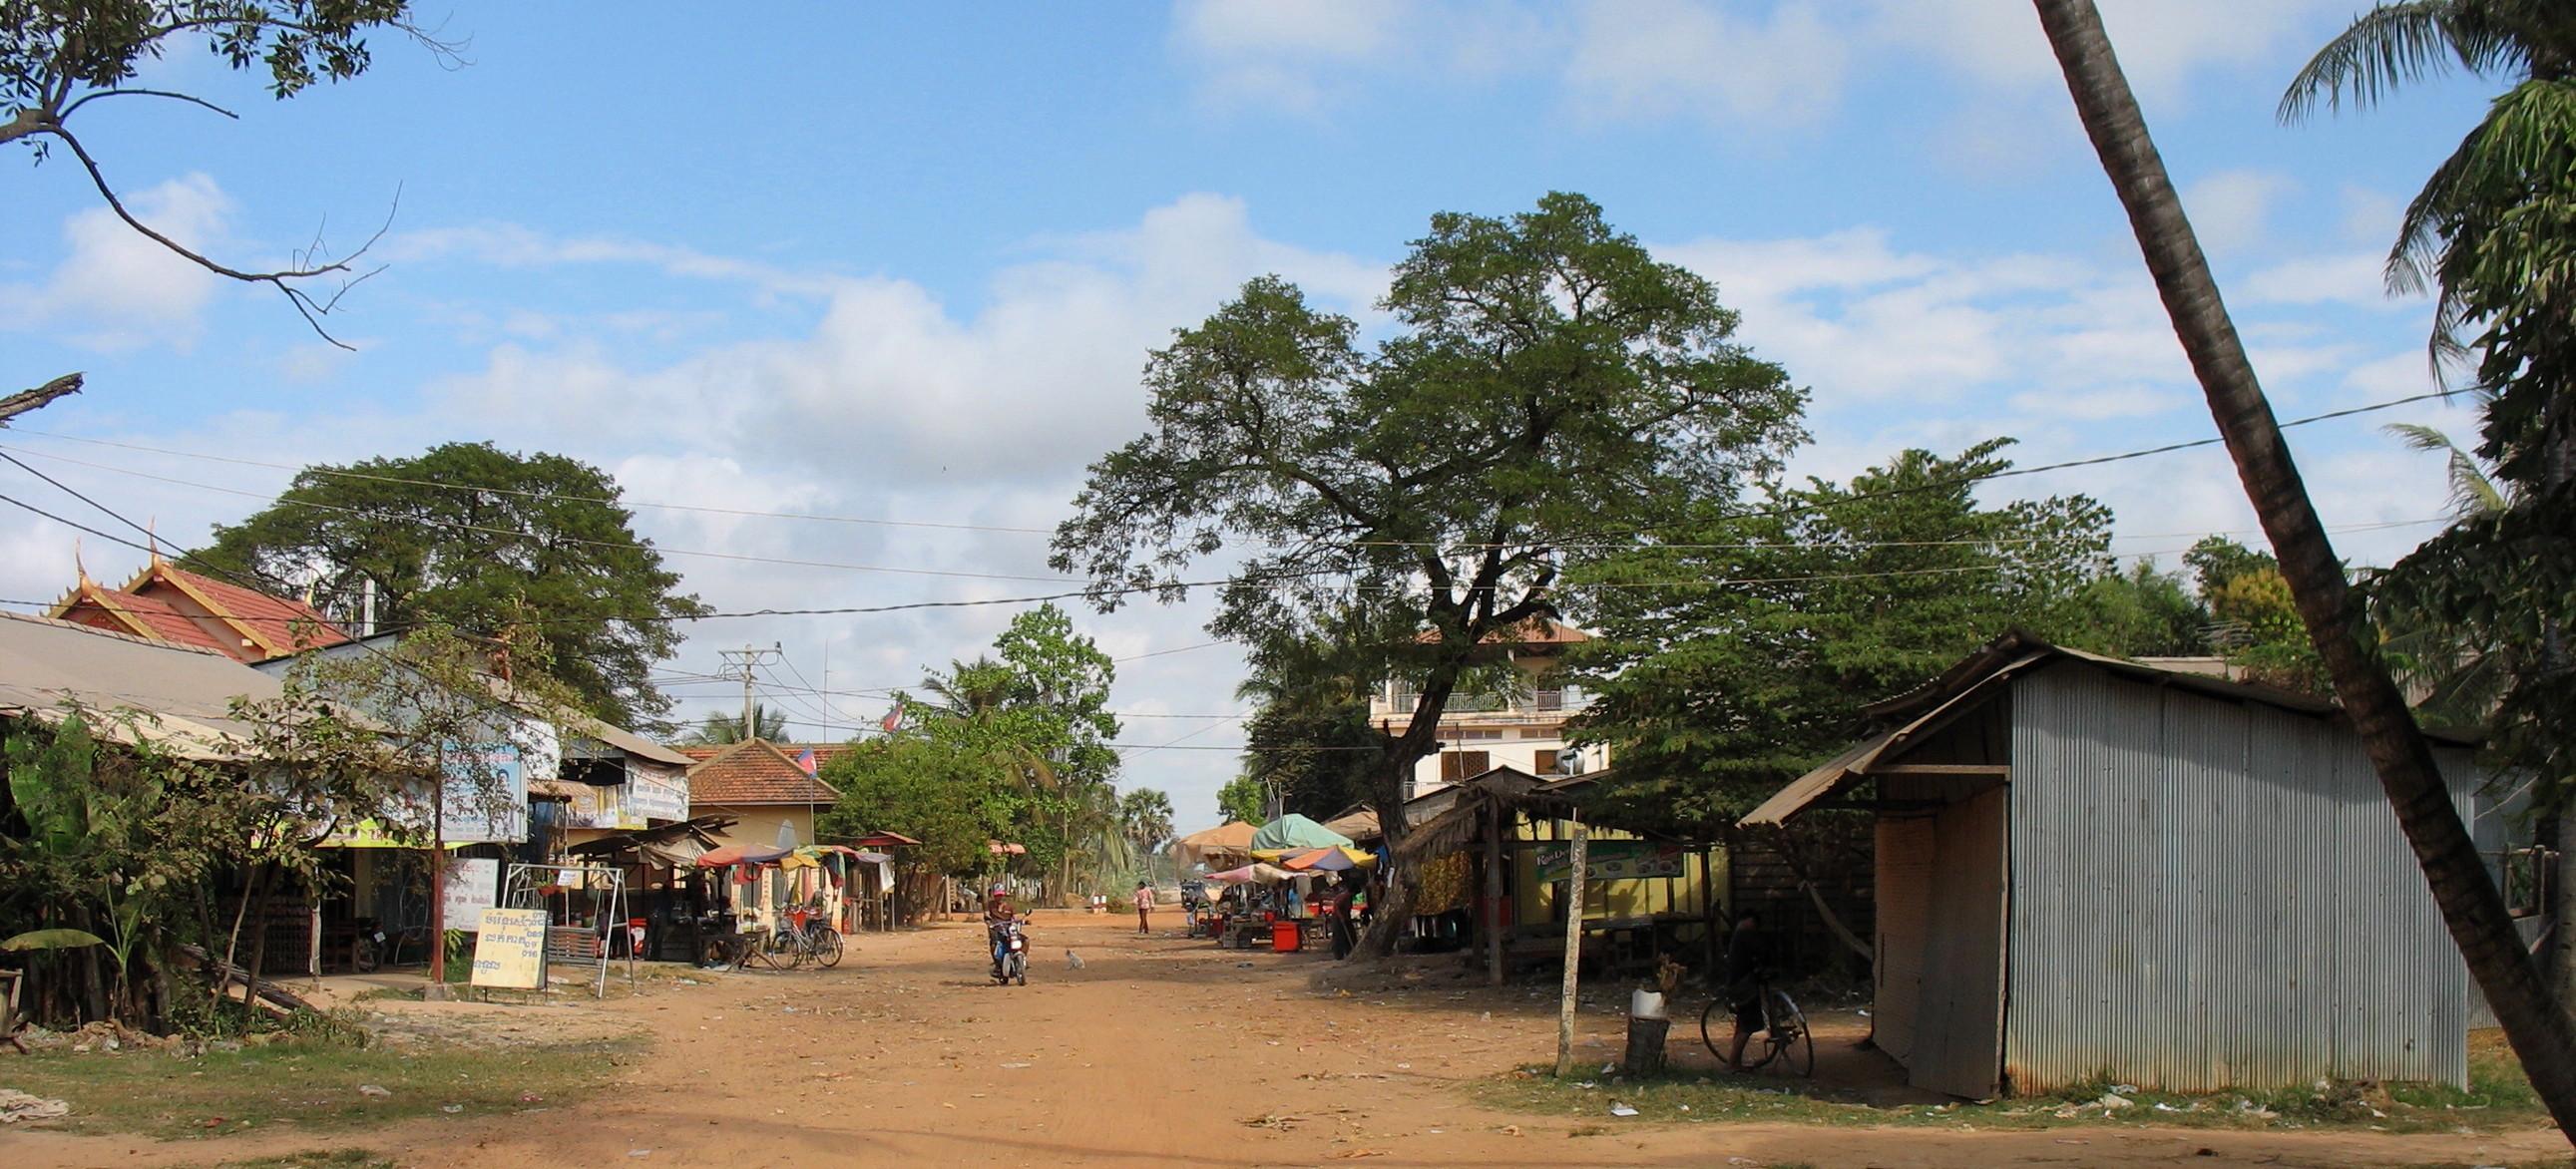 platteland2